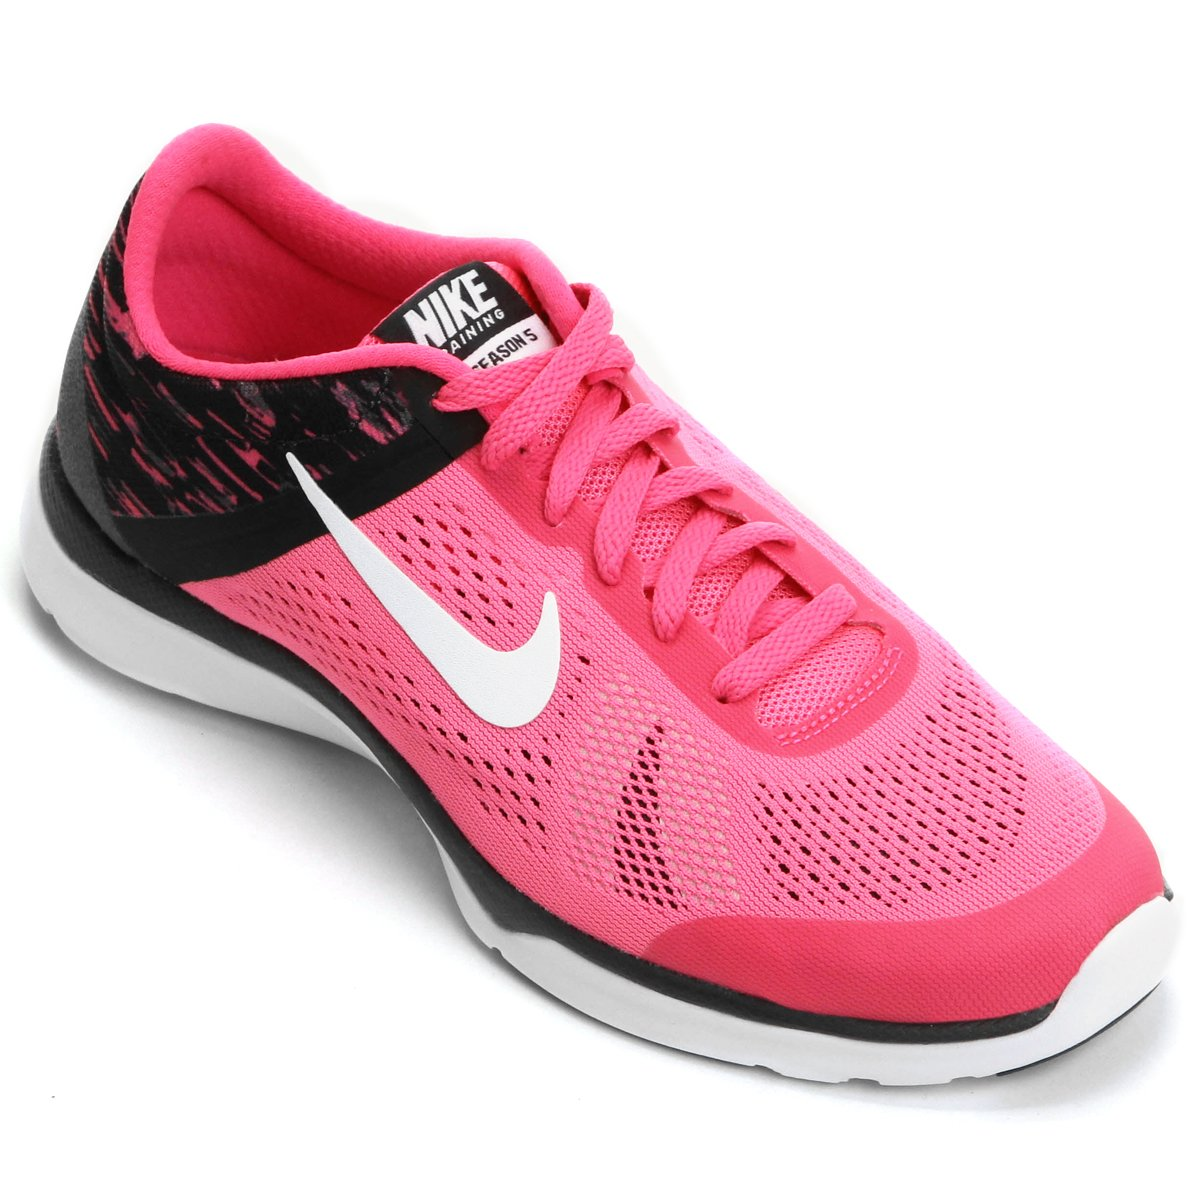 ba0fcac8e3b Tênis Nike In-Season Tr 5 Print Feminino - Compre Agora